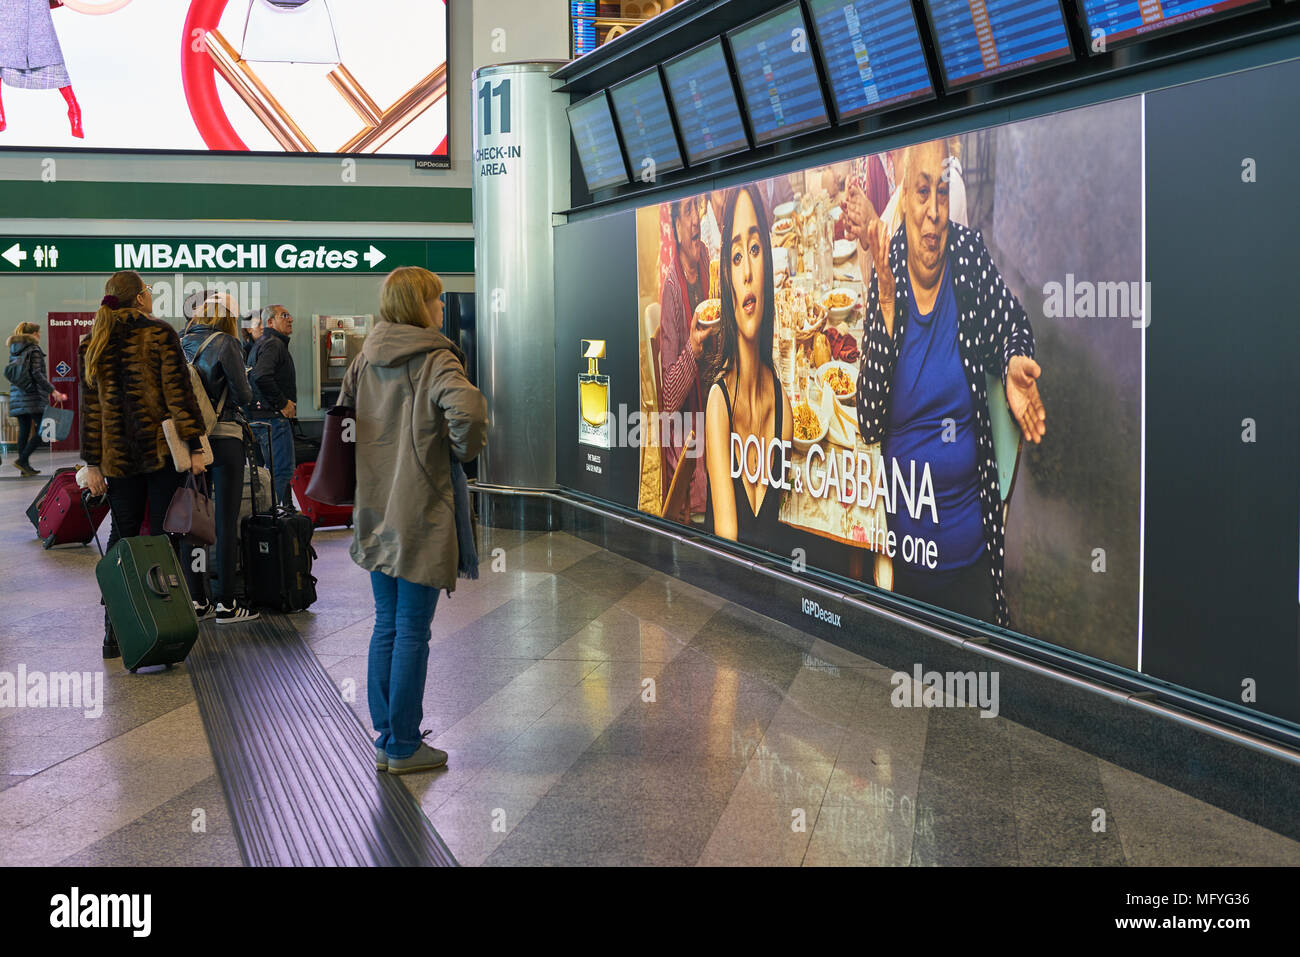 MILAN MALPENSA, ITALY - CIRCA NOVEMBER, 2017: passengers standing in front of the flight information display monitors at Milan-Malpensa airport. - Stock Image